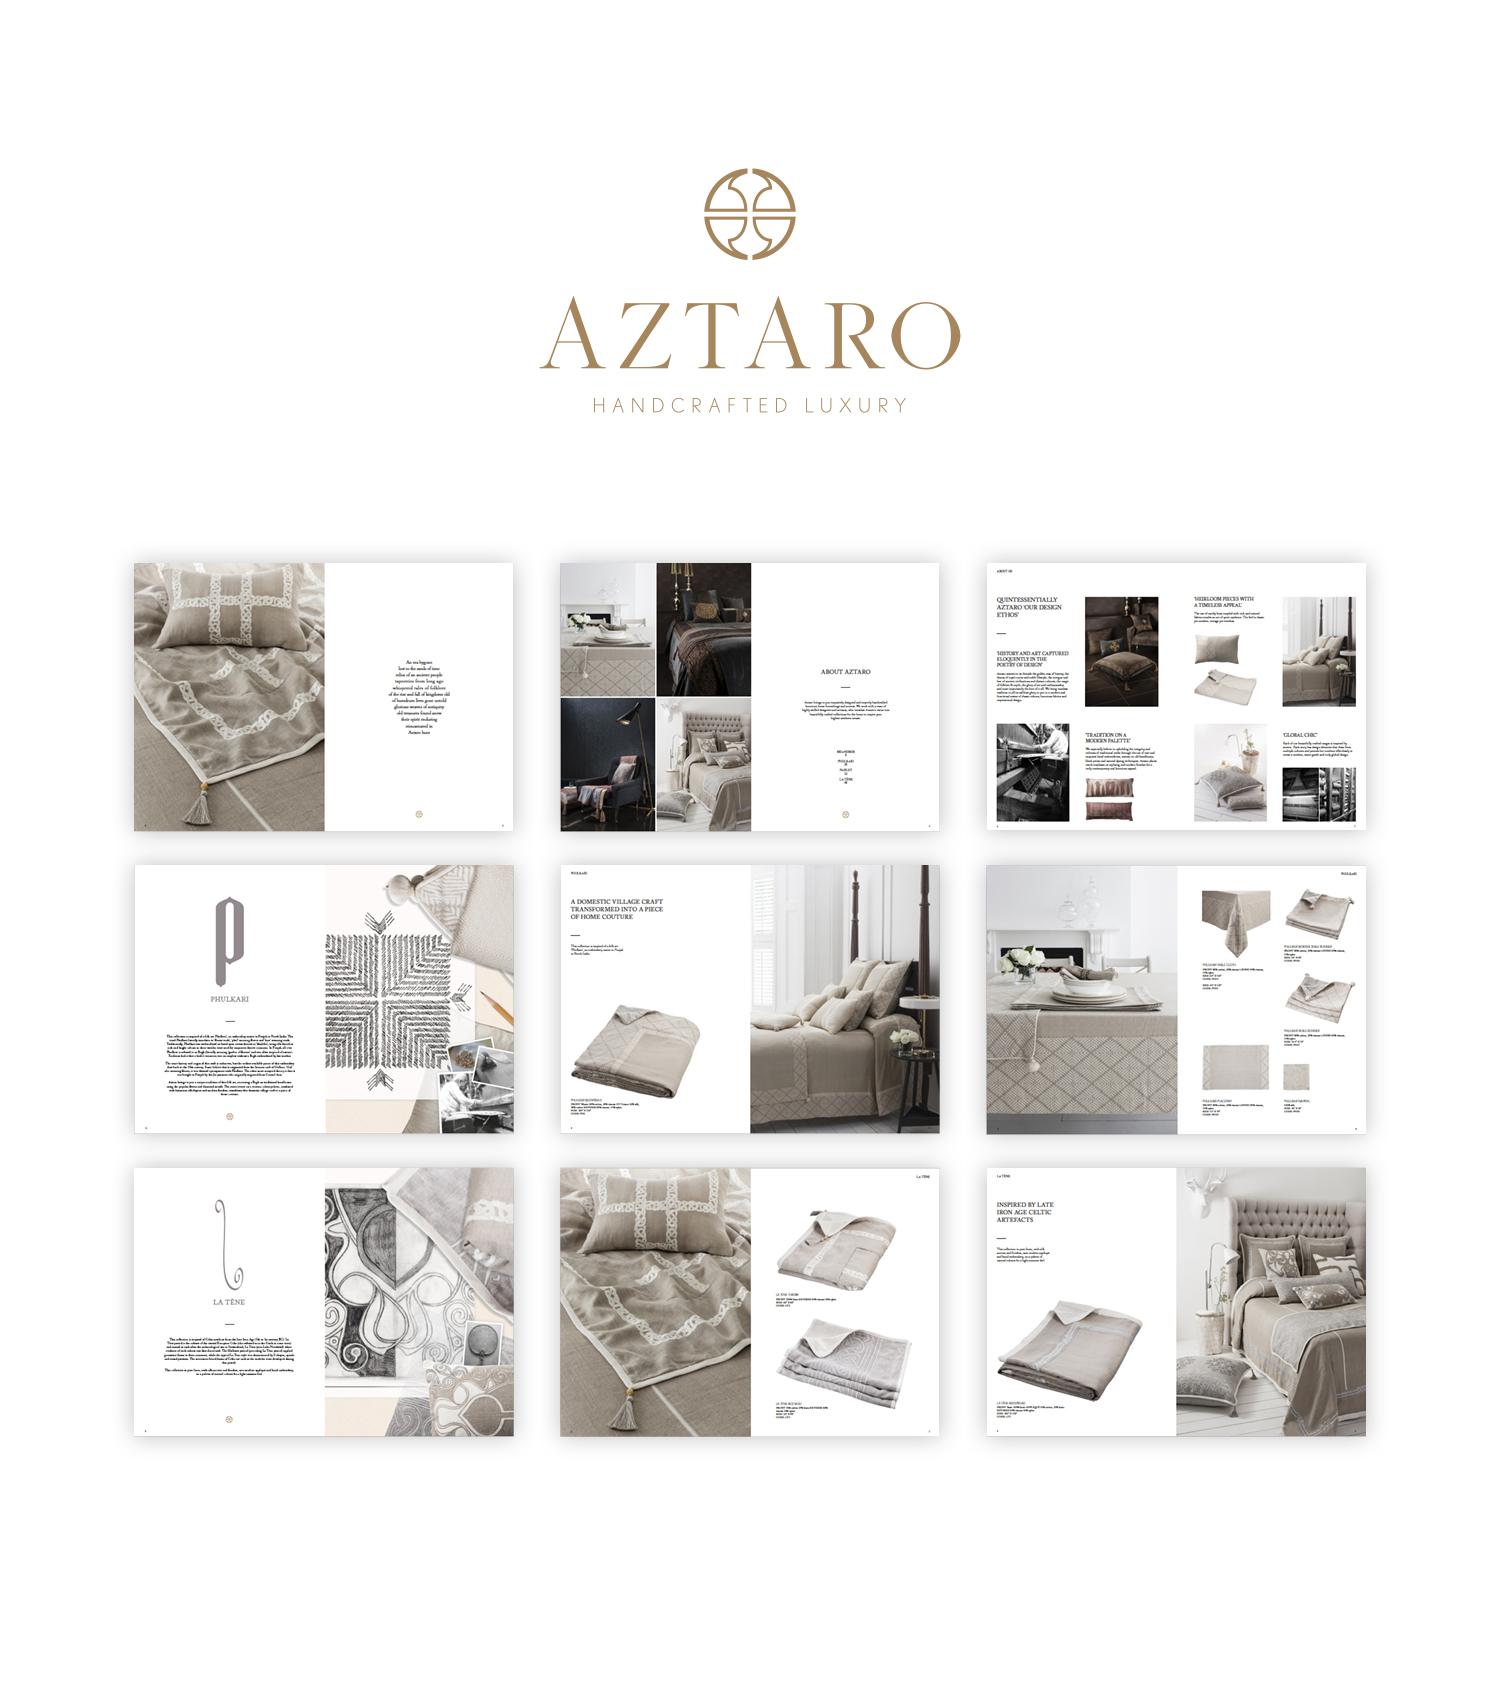 Interiors_Branding-And-Design-Aztaro.jpg